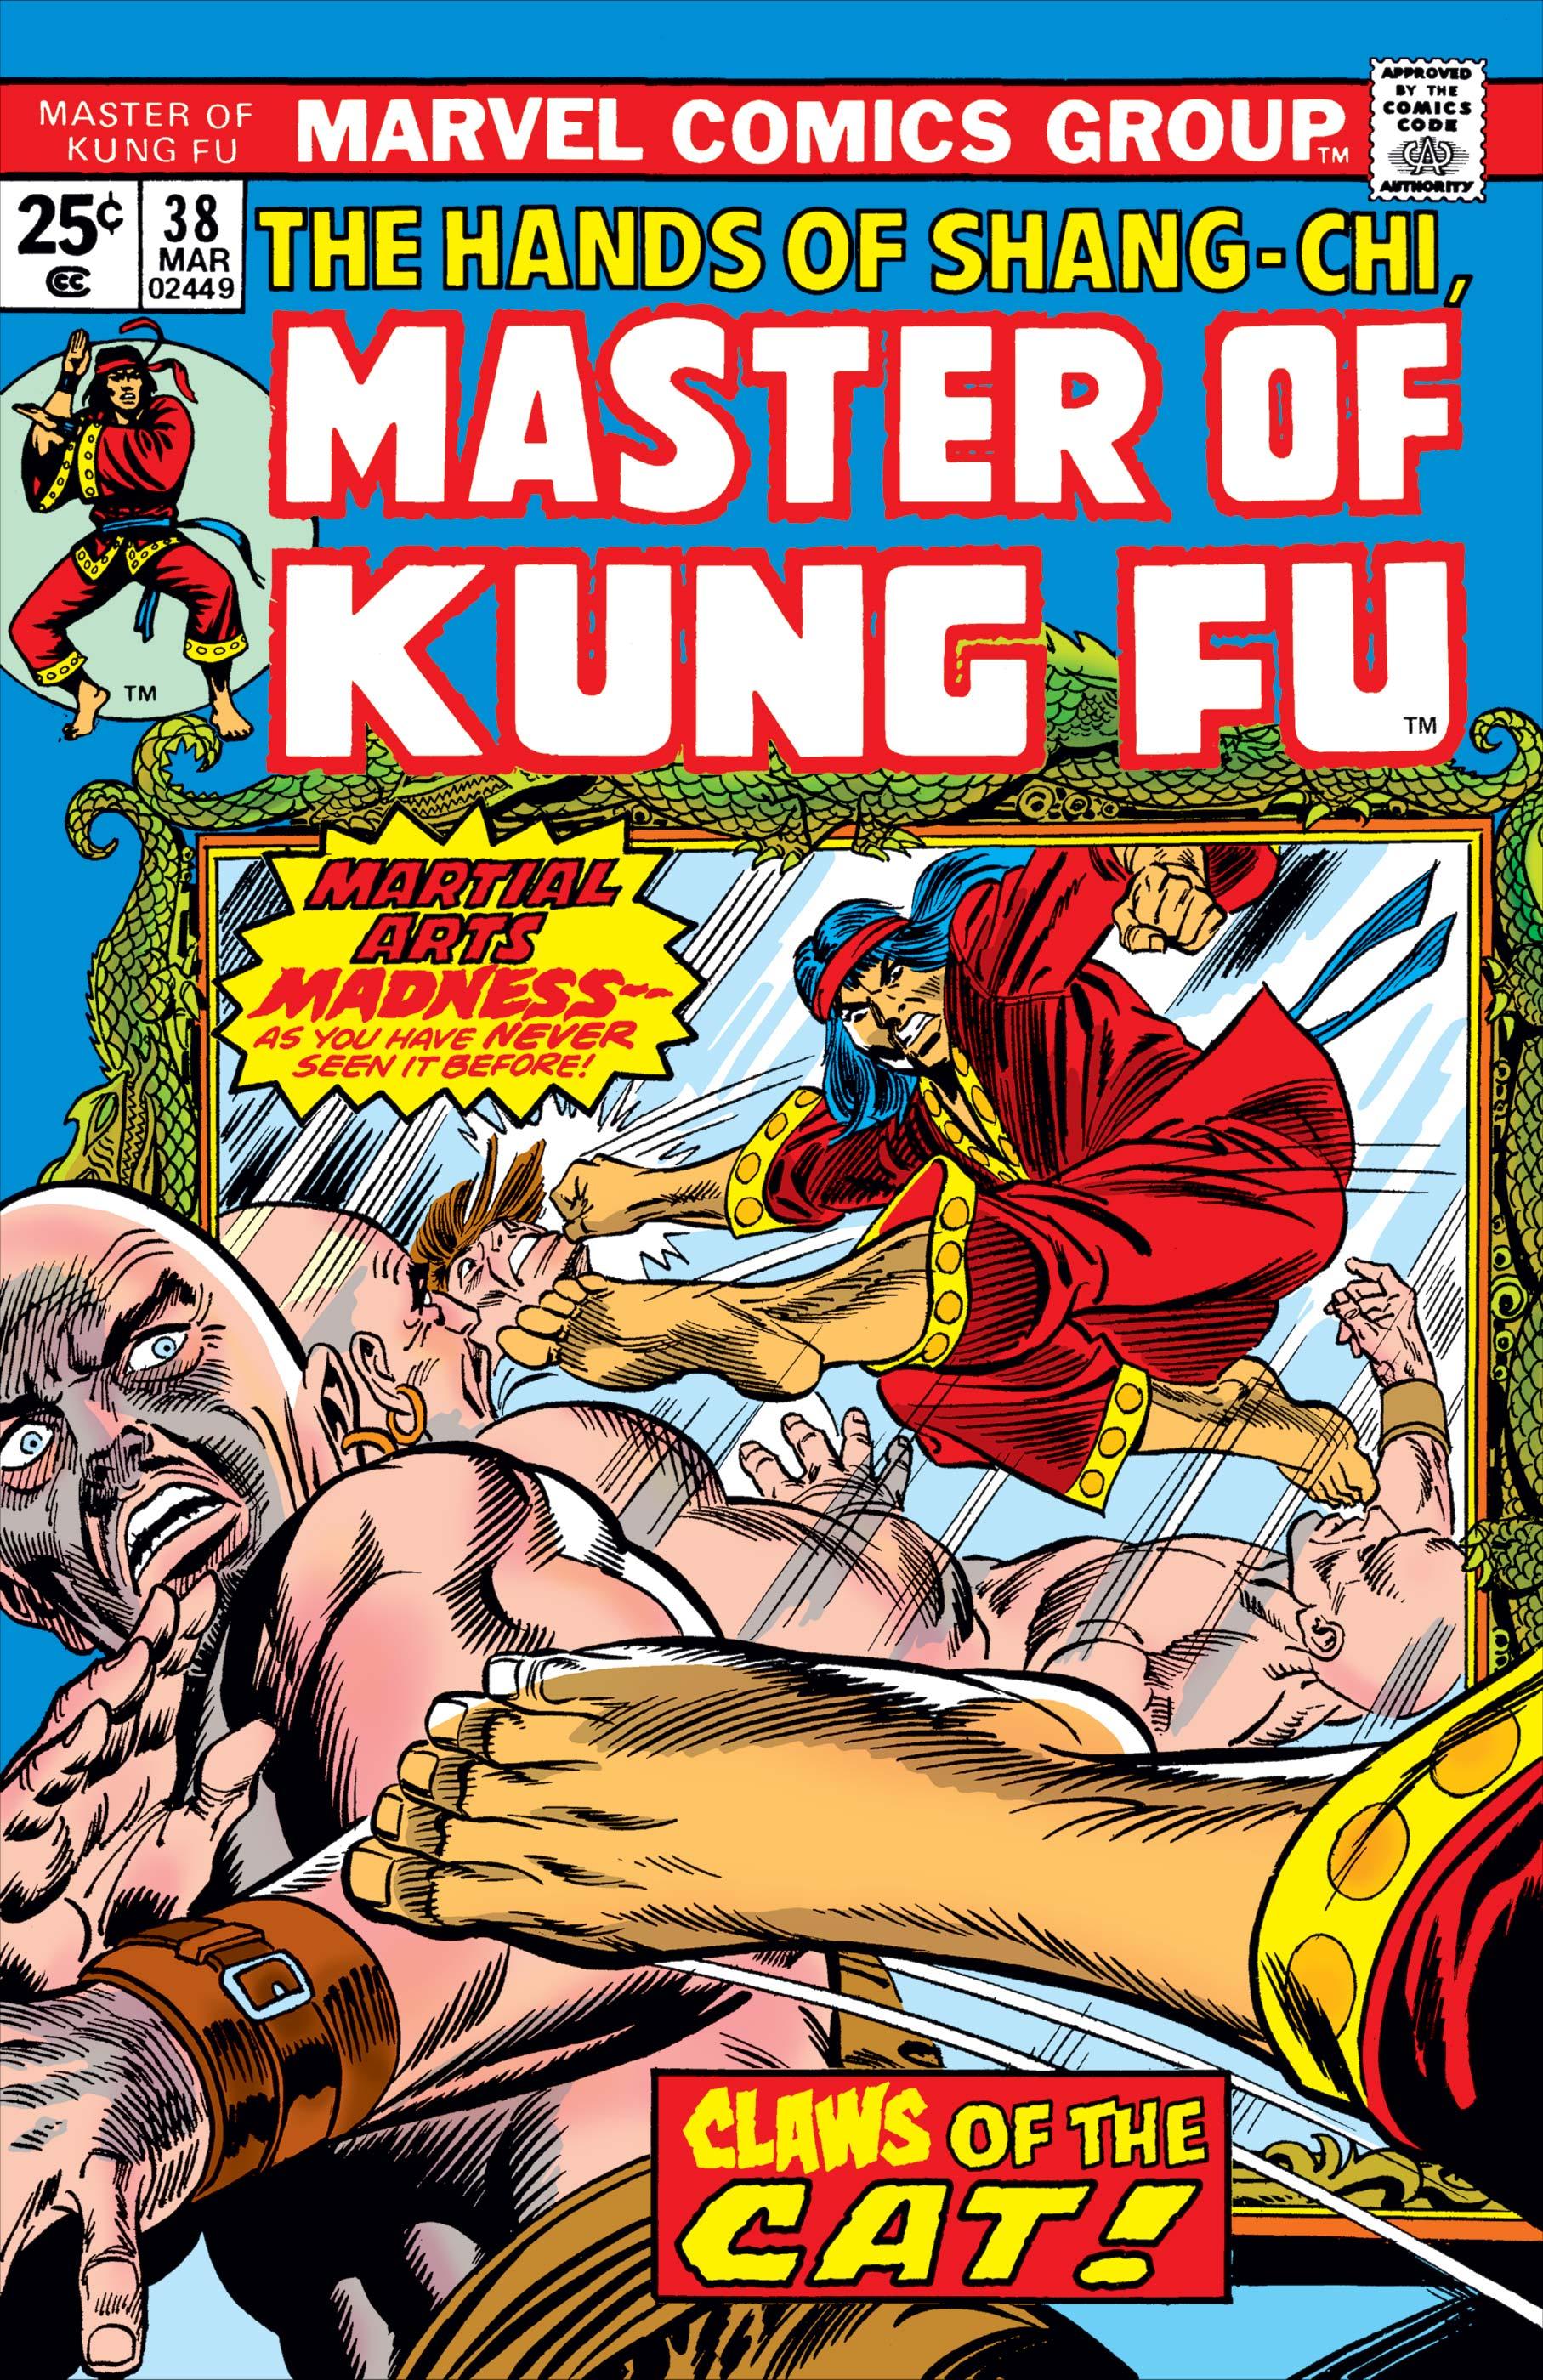 Master of Kung Fu (1974) #38